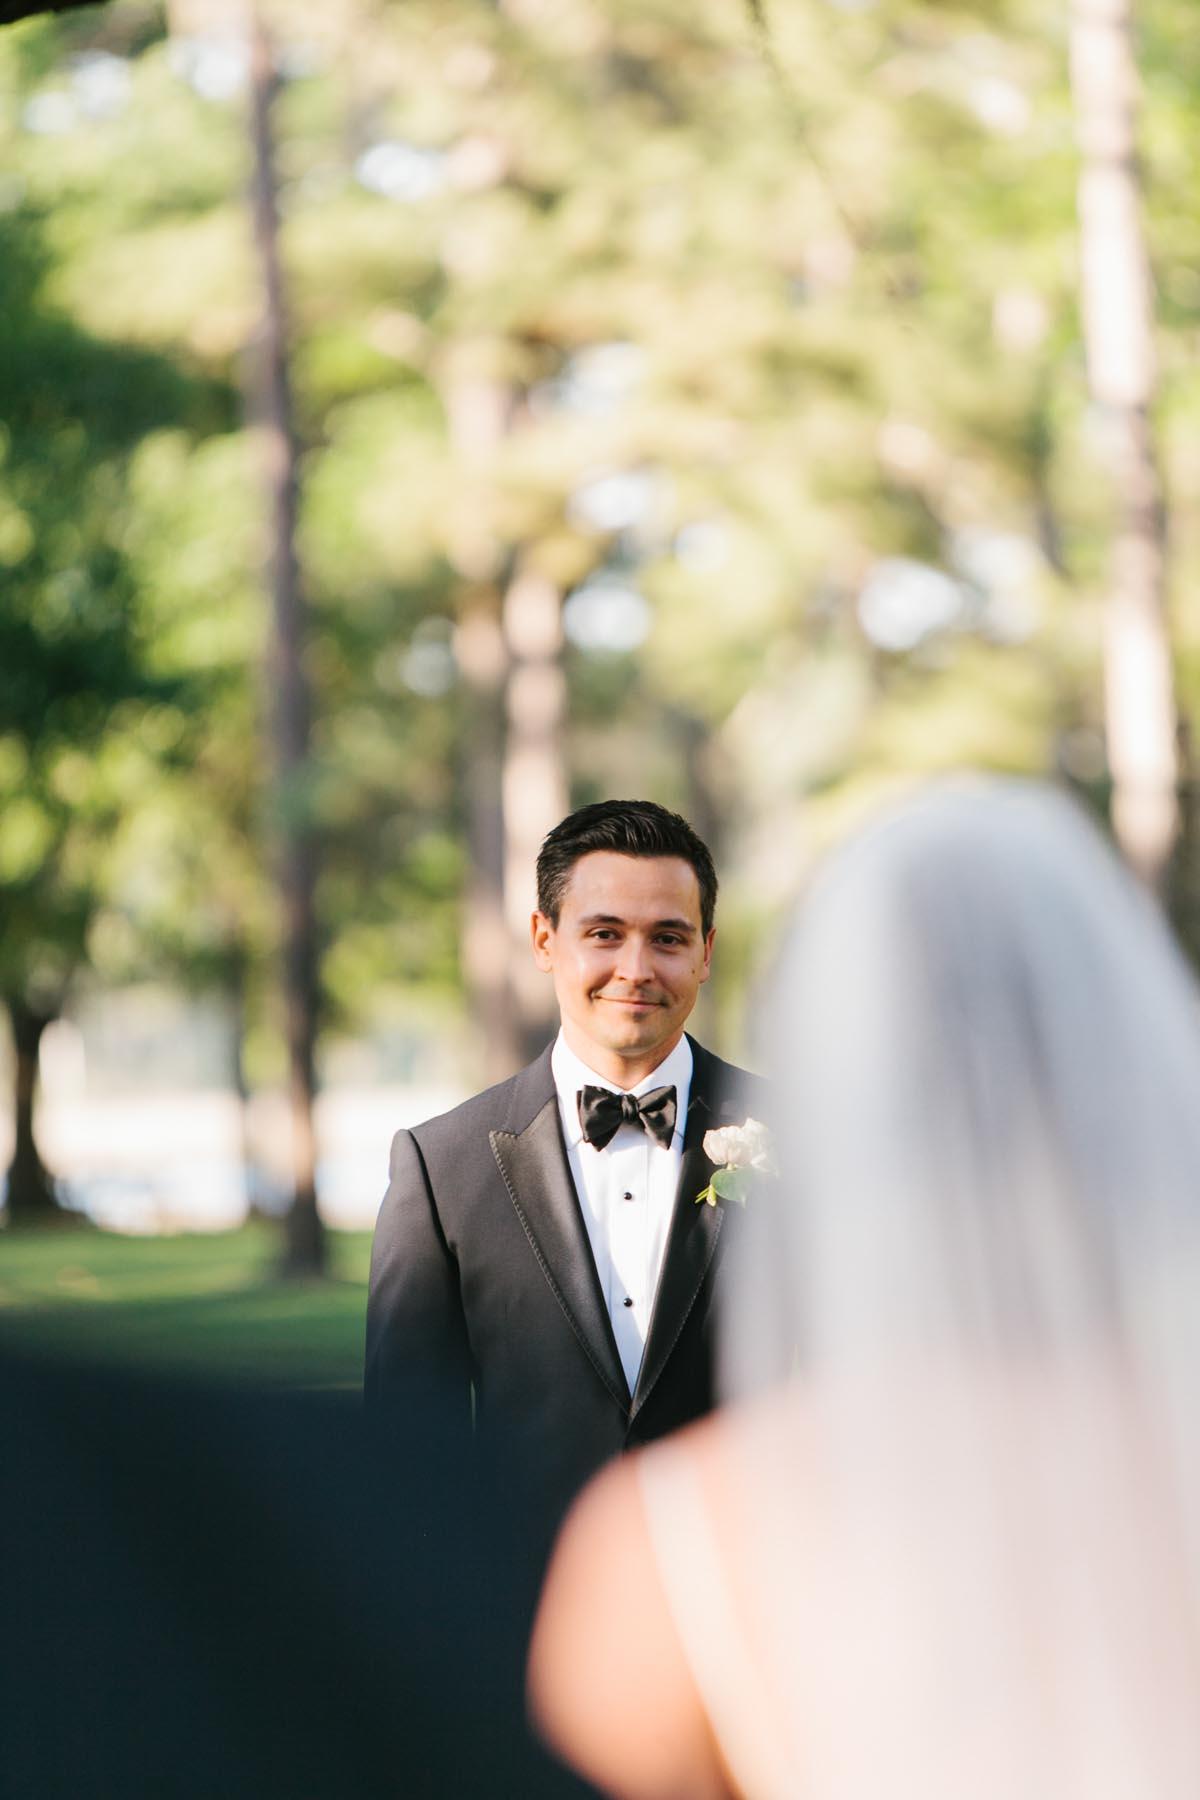 lowry wedding blog eden garden florida wedding-60